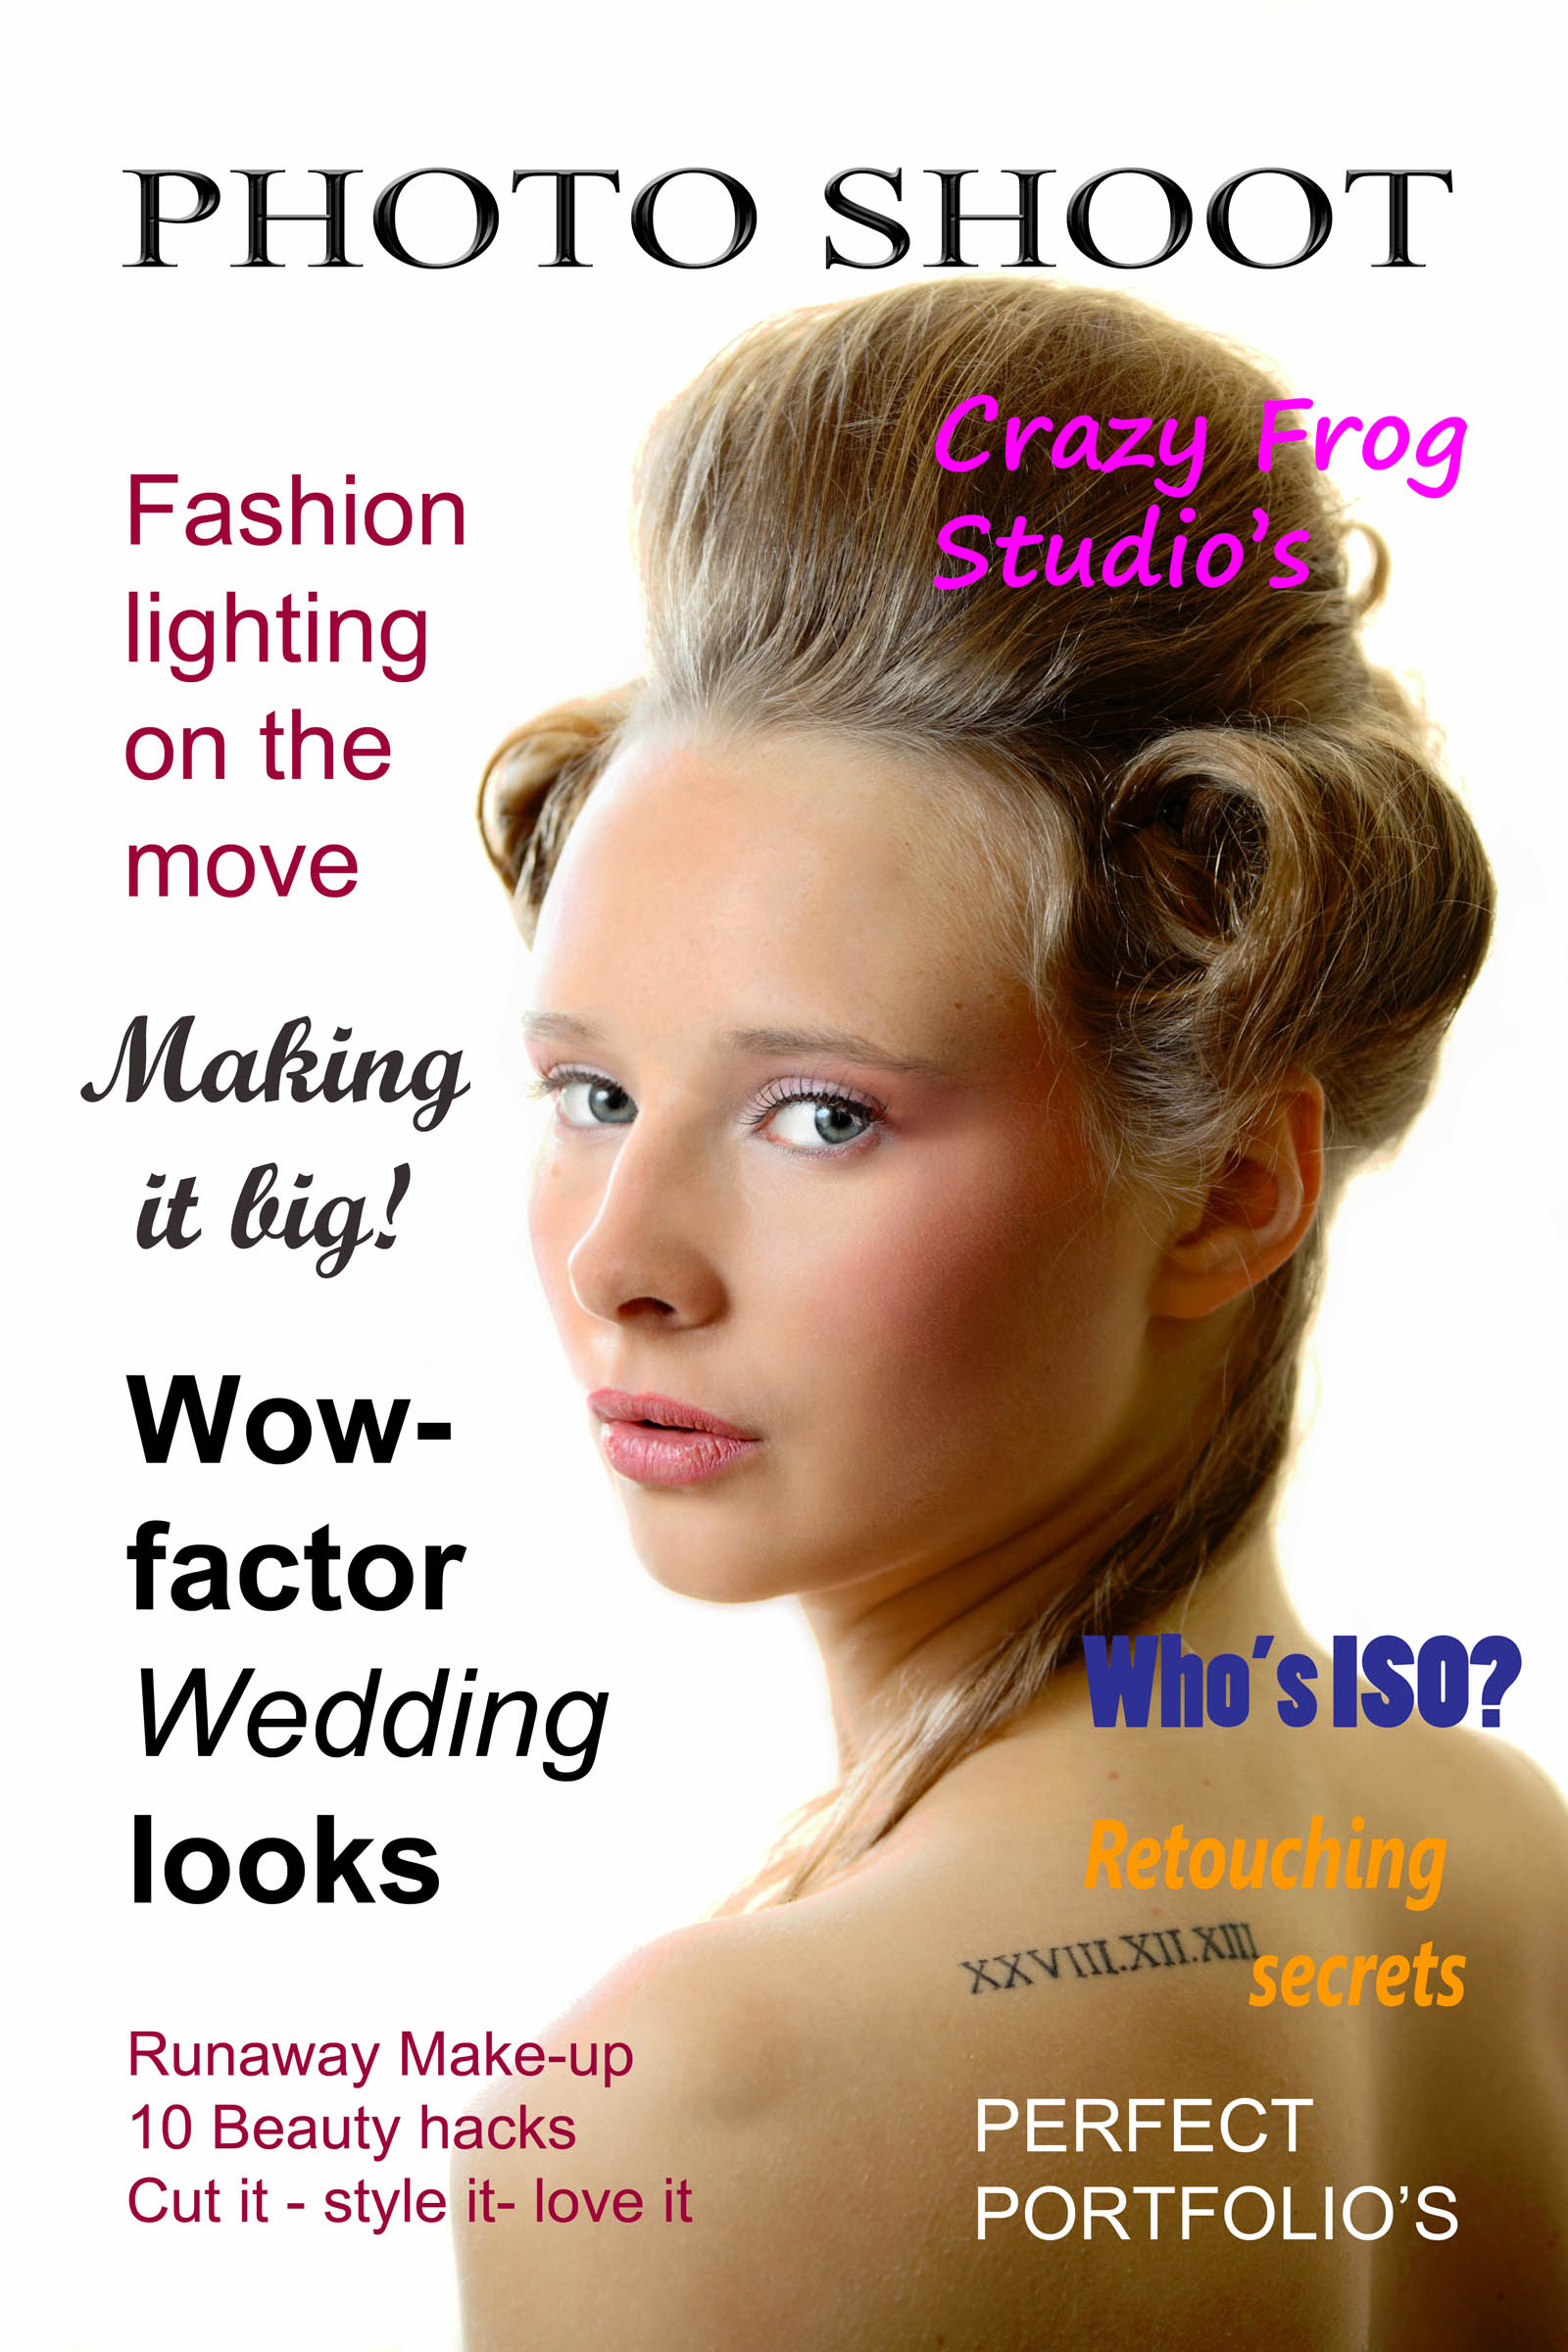 Photo Shoot magazine sample cover headshot